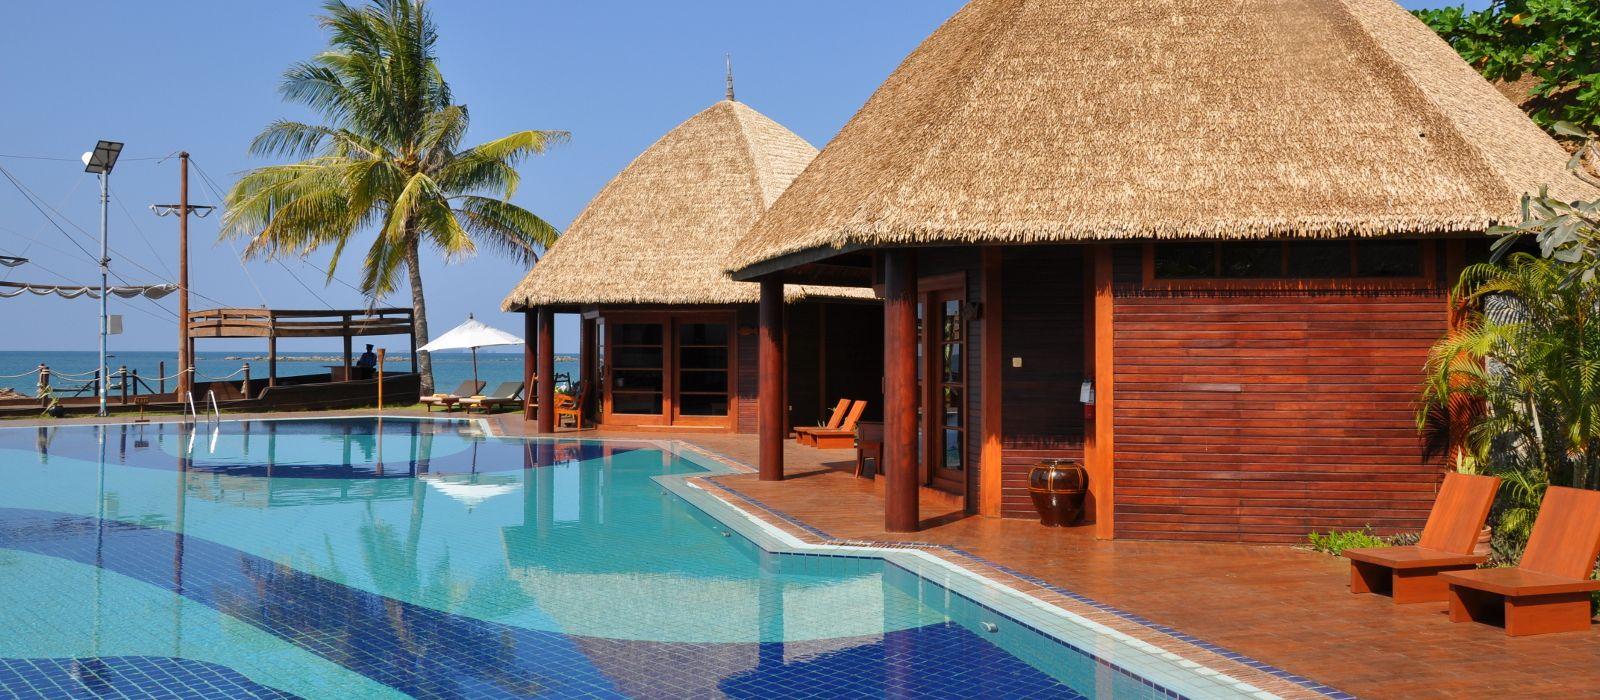 Hotel Aureum Resort & Spa Ngwe Saung Myanmar